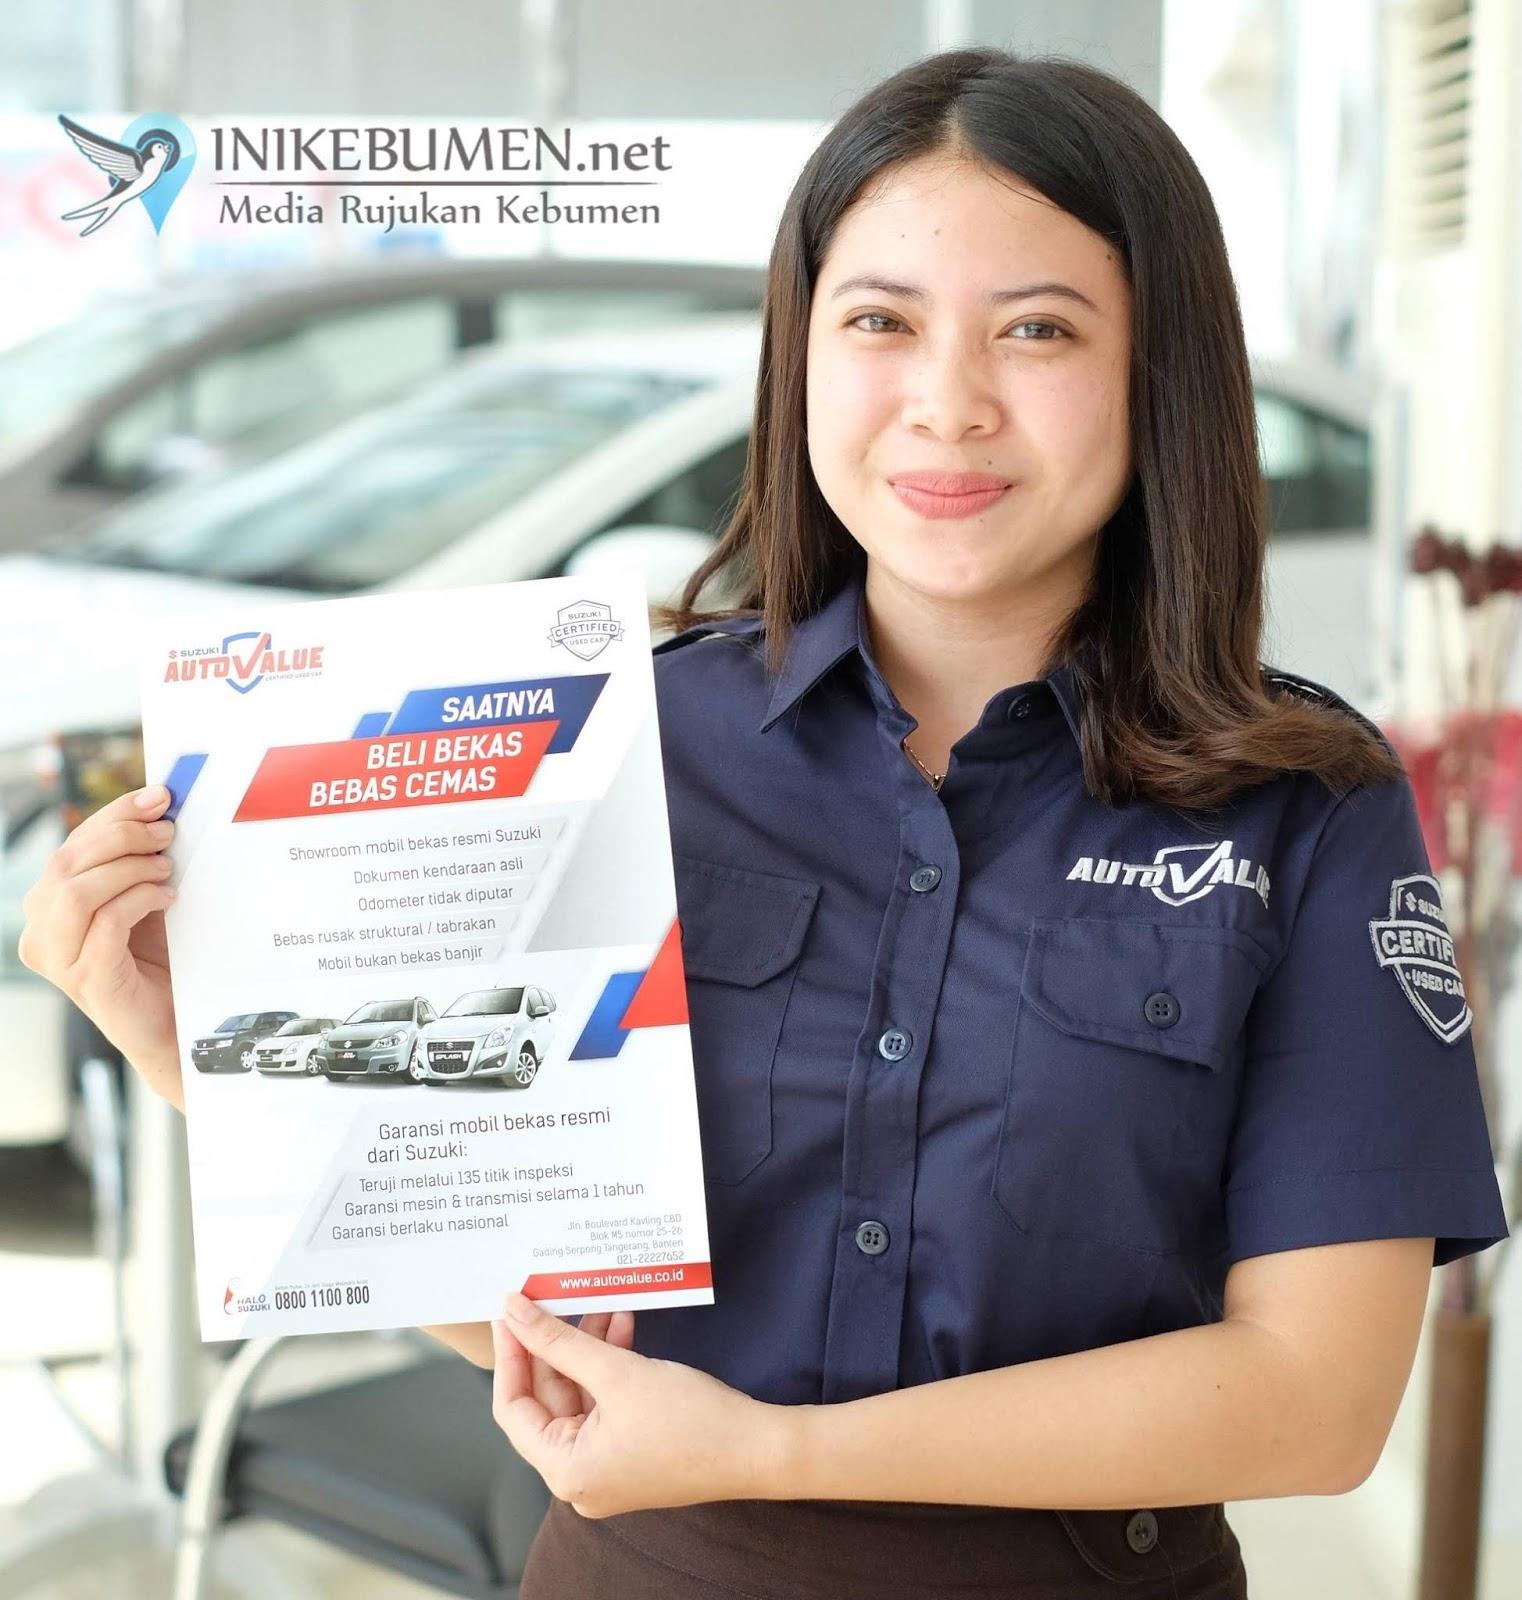 Minat Pelanggan Tinggi, Suzuki Auto Value Berikan Program Ertiga Vaganza